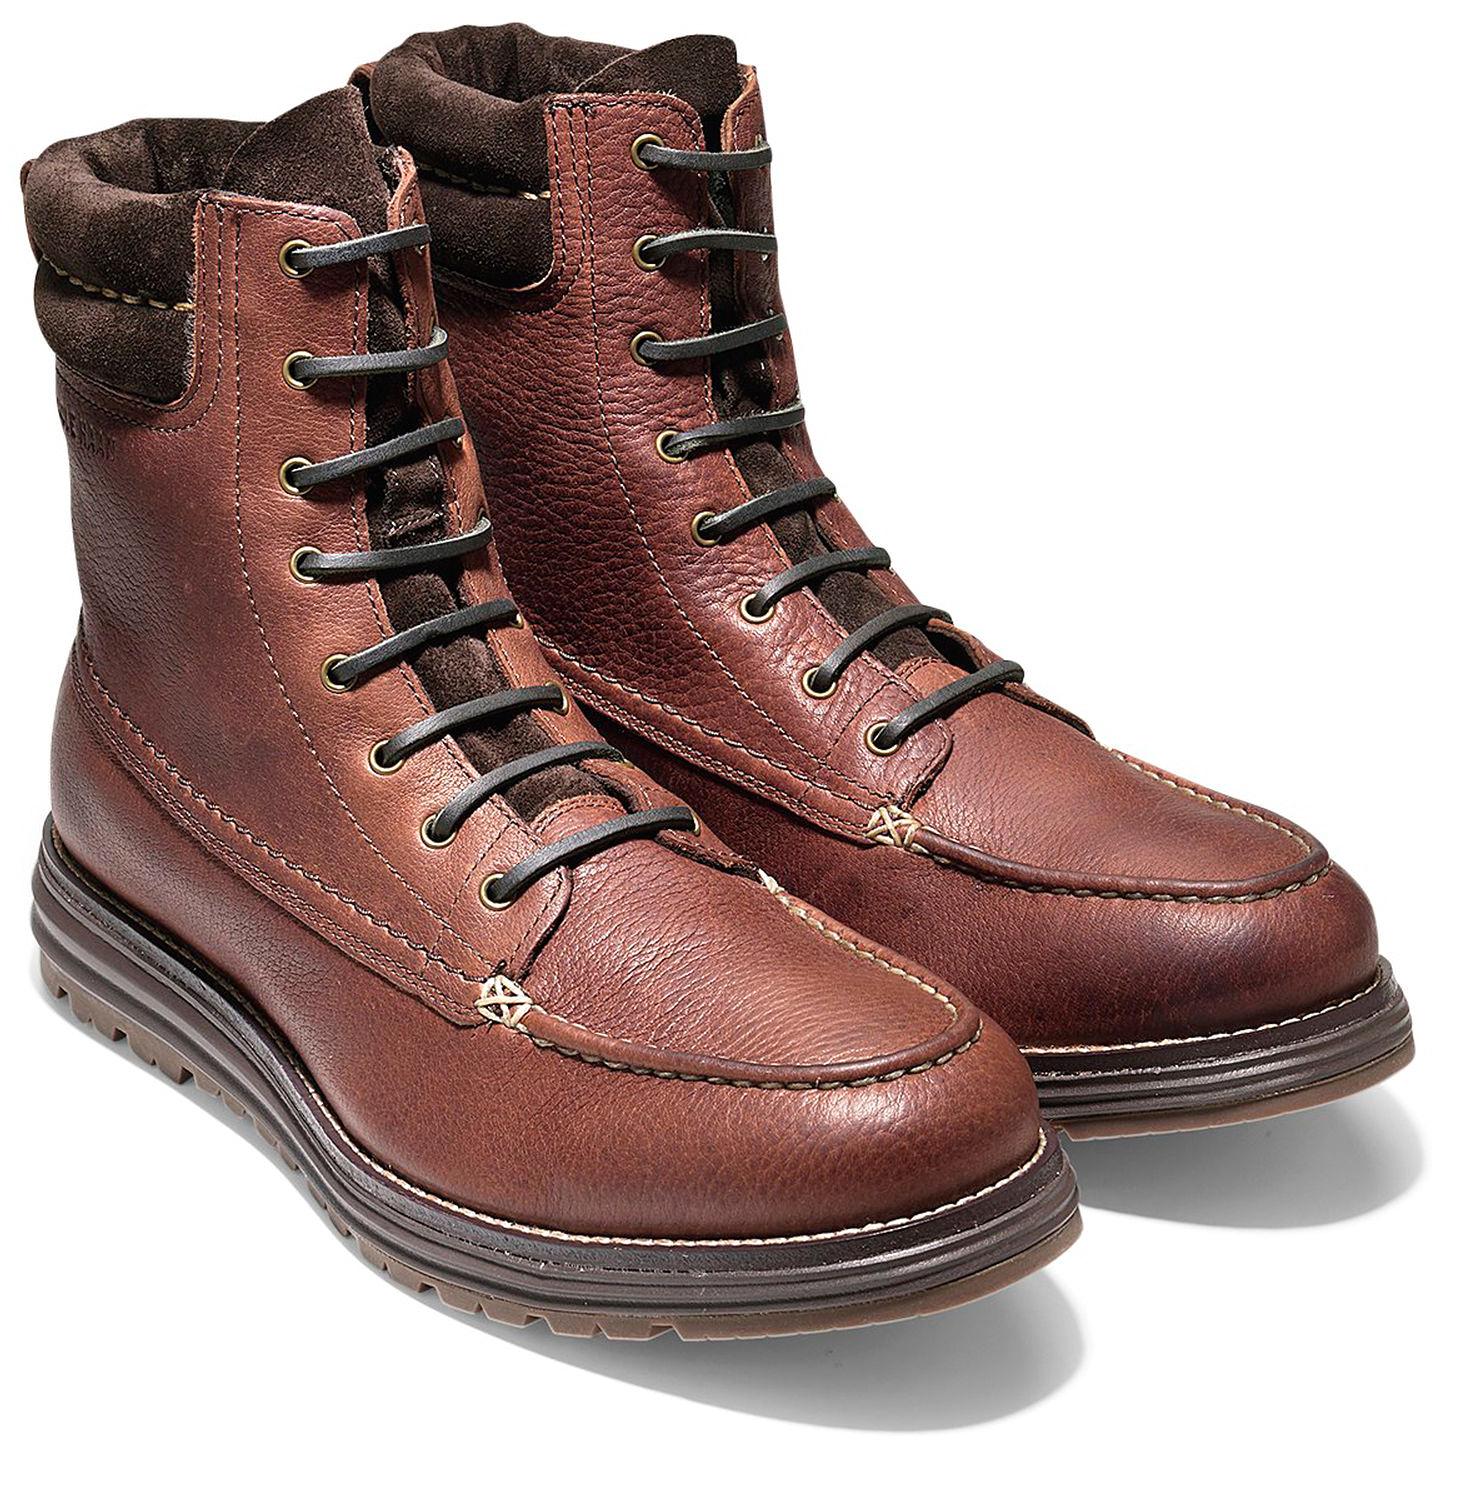 734dc92974d Cole Haan Men s Lockridge Moctoe Boot WP C23214 Harvest Brown - The ...